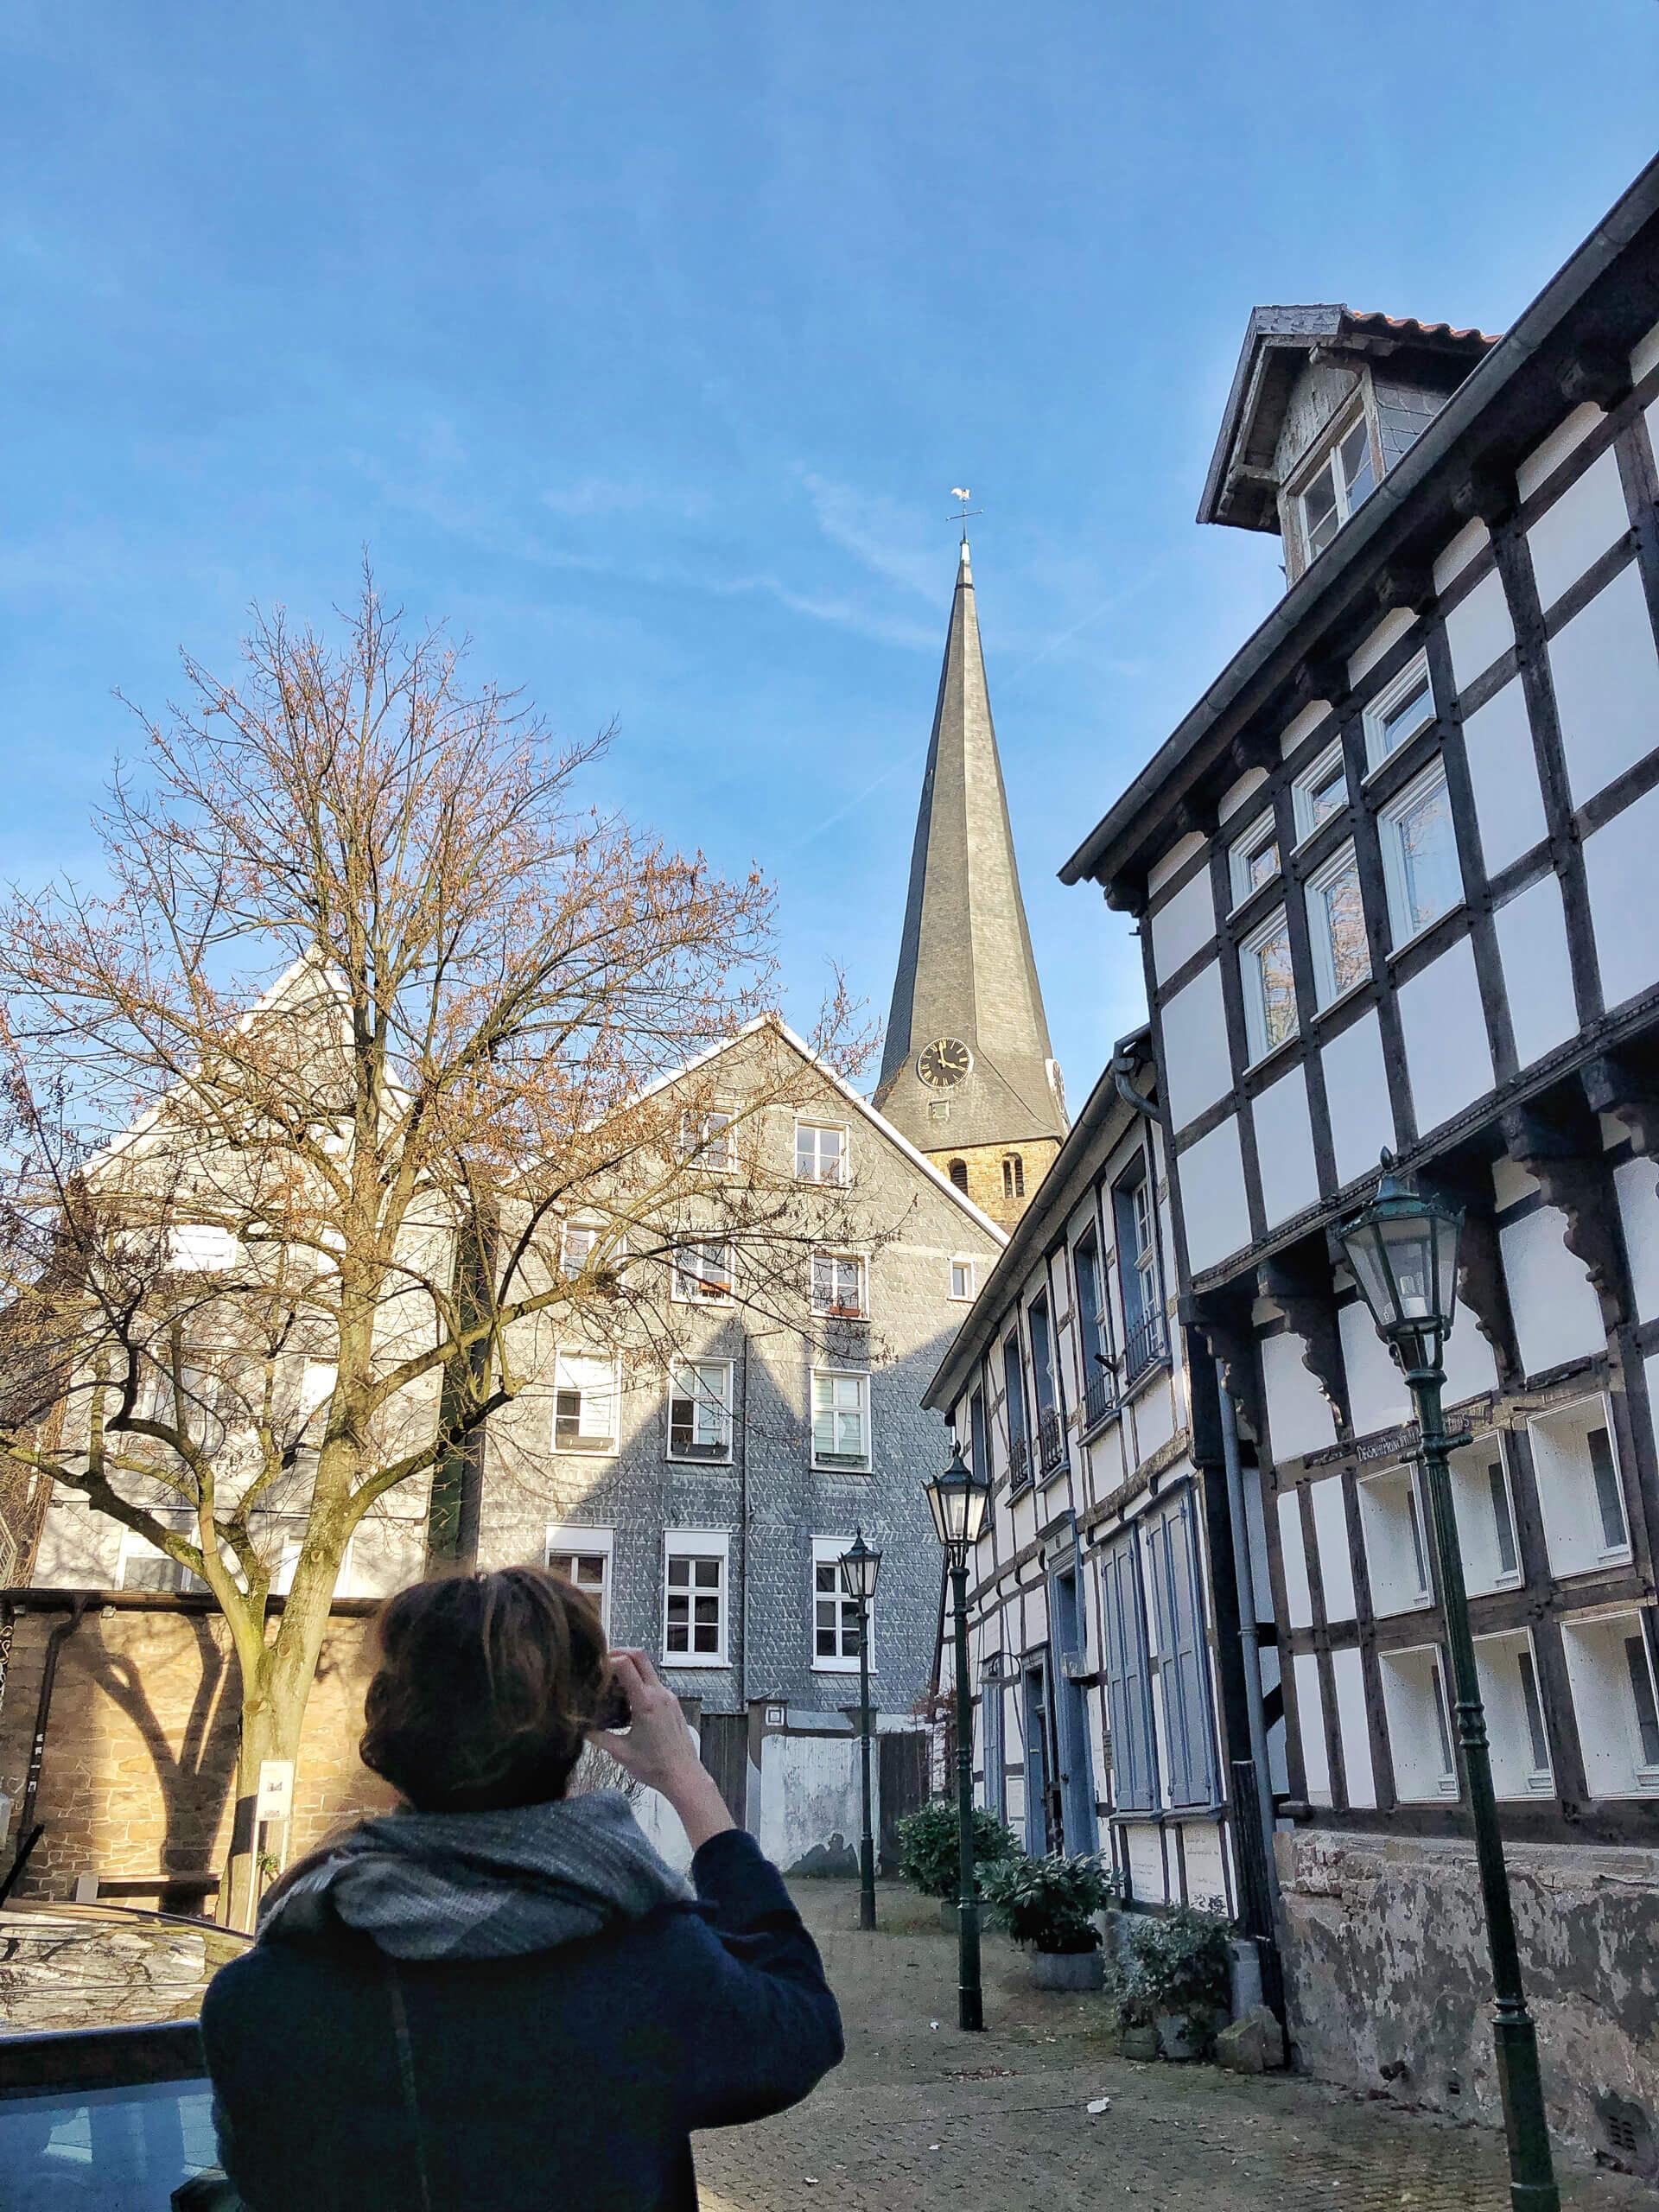 Hattinger Innenstadt schiefer Turm